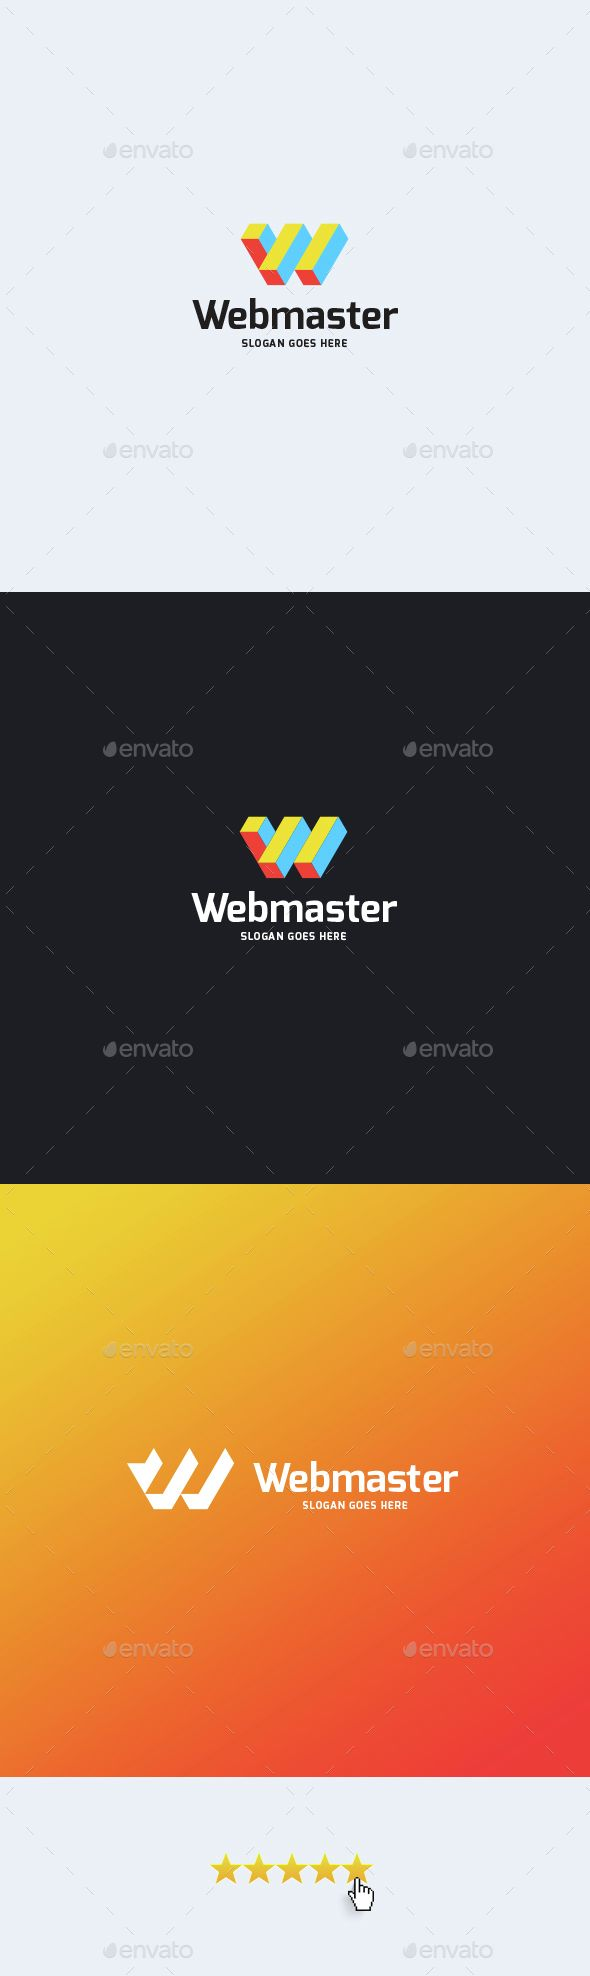 Webmaster u2022 Letter W Logo Template u2014